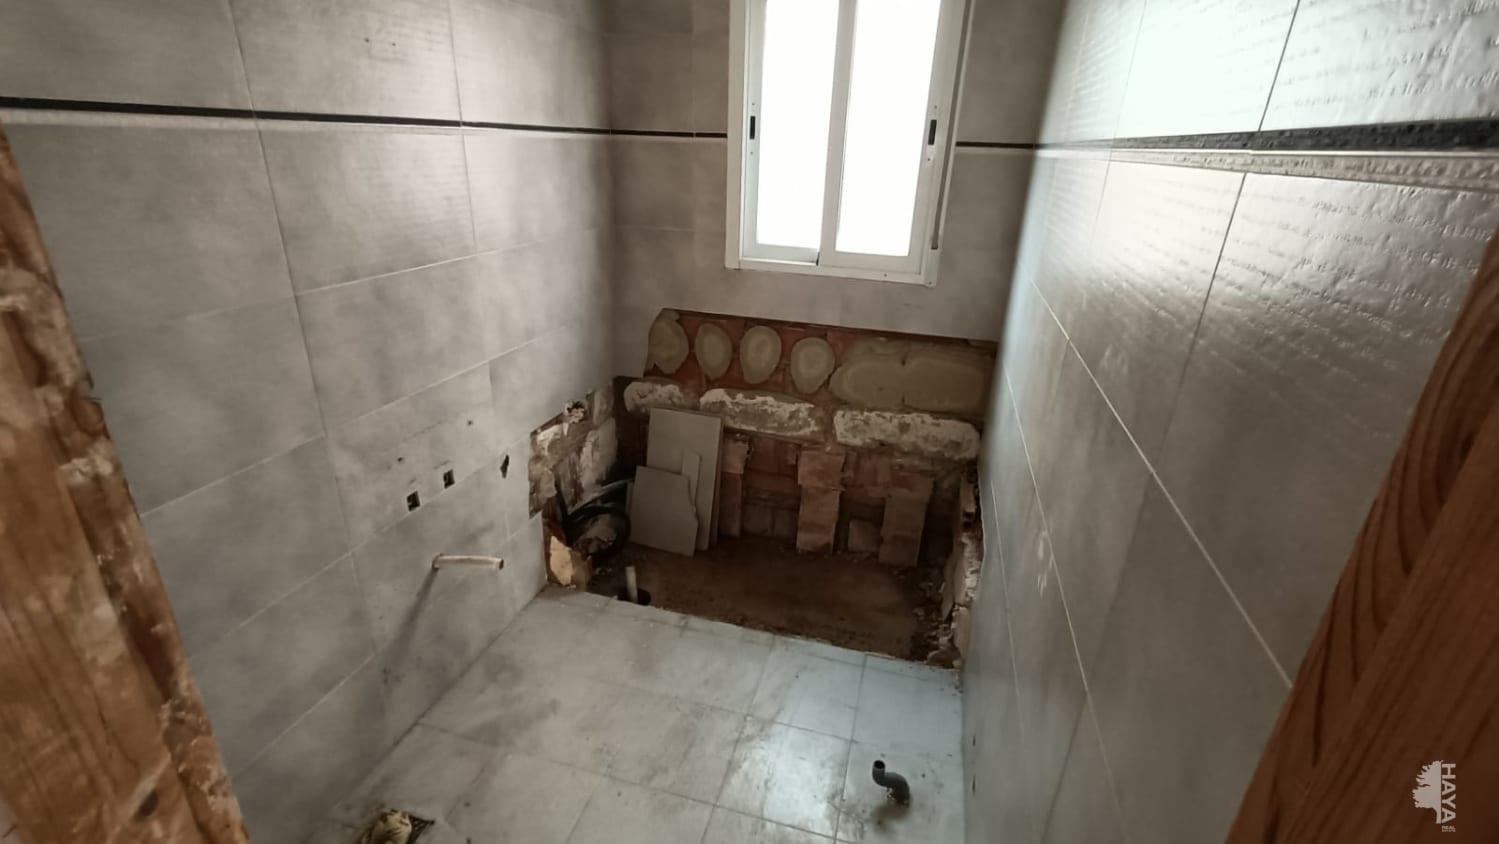 Piso en venta  en planta baja para reformar en avenida blasco ibañez, 46720, villalonga (v - imagenInmueble6